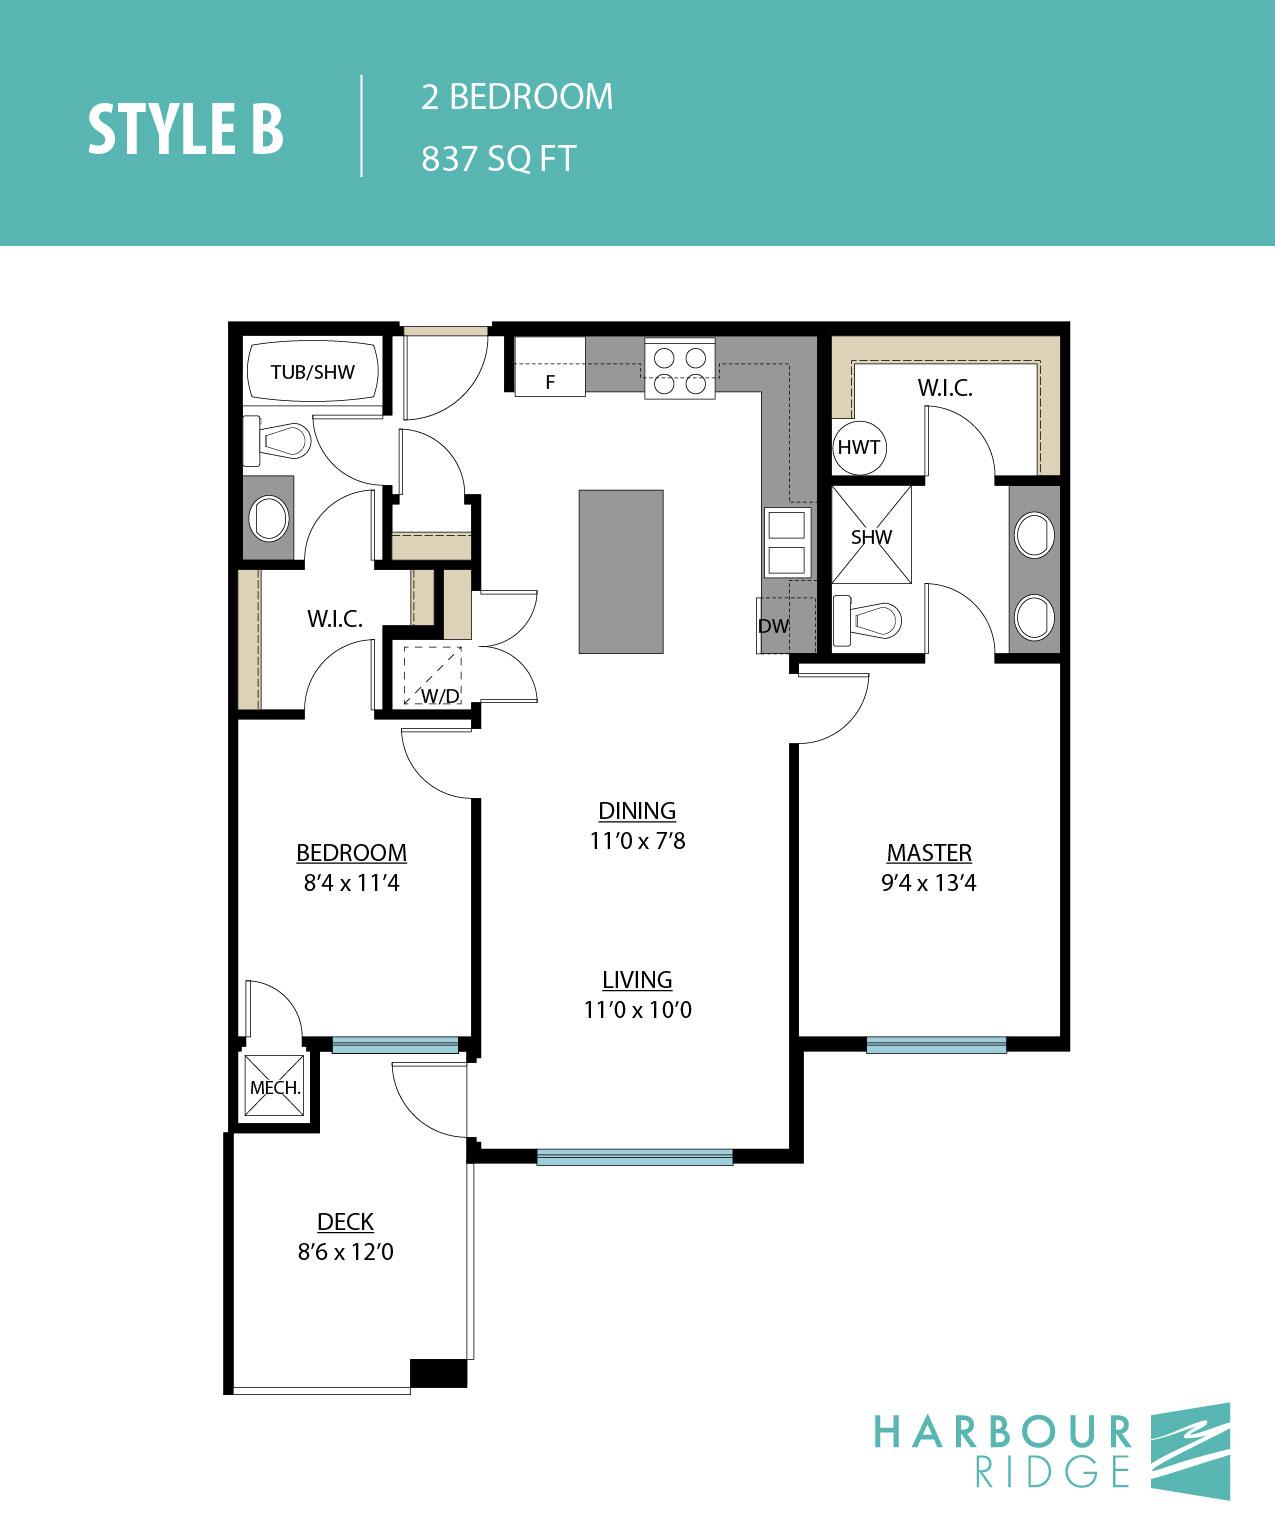 Style B | 2 Bedroom | 837 Sq. Ft.